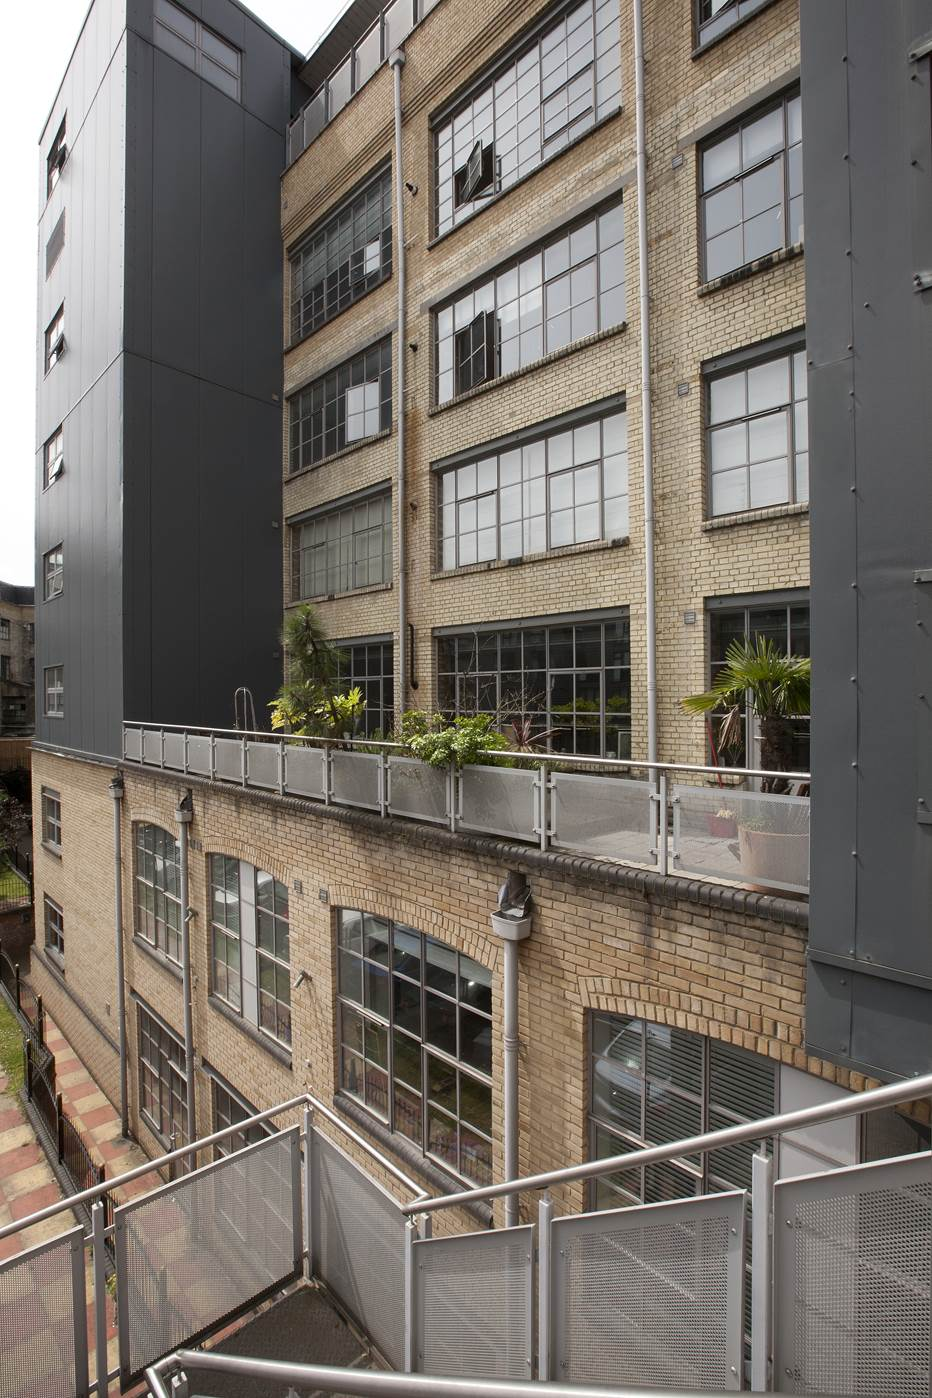 Akzonobel Paints Help Transform Factory Into Modern Living Space